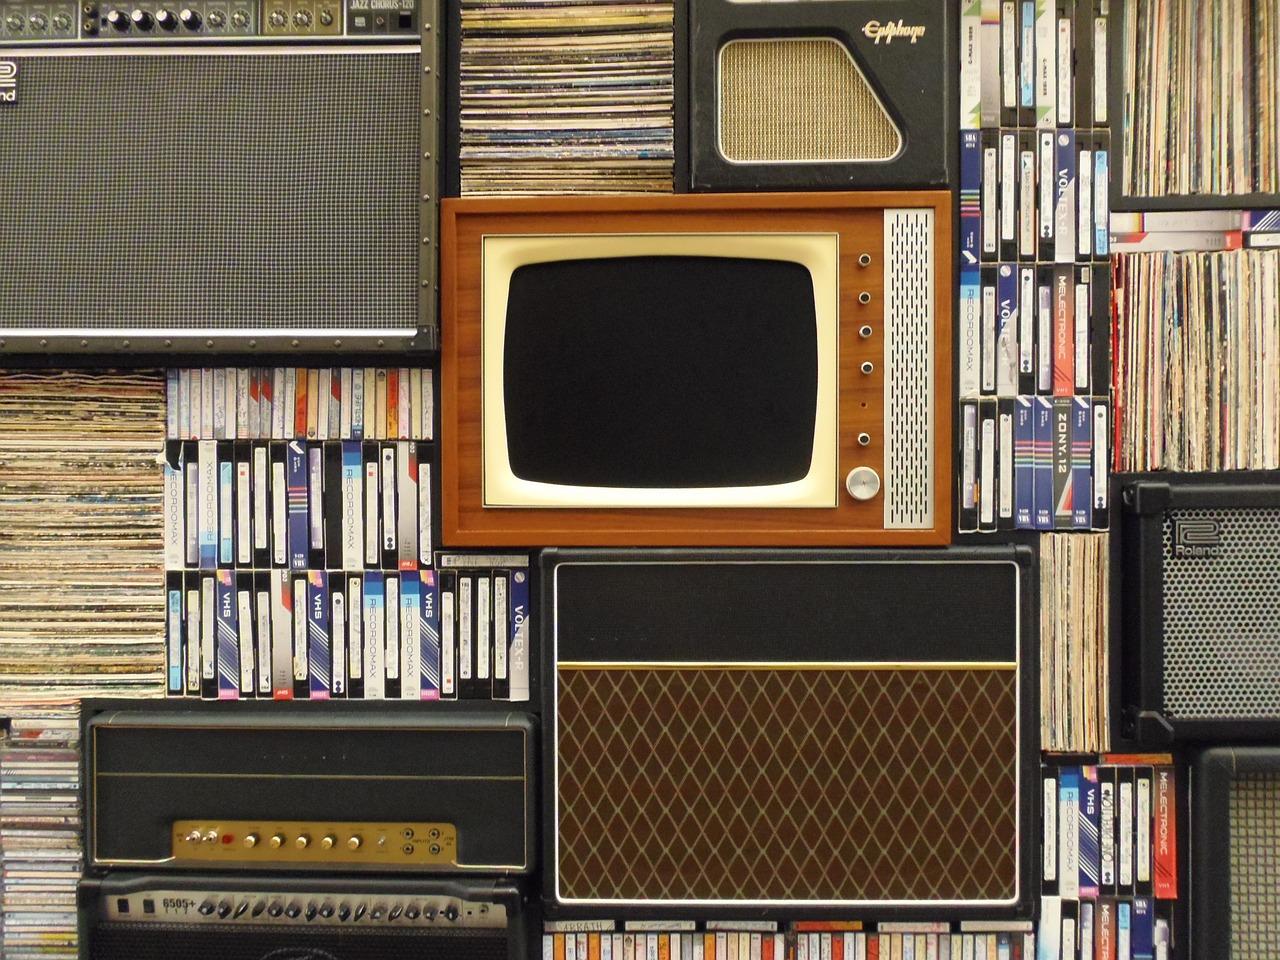 Trends in der Medienbranche